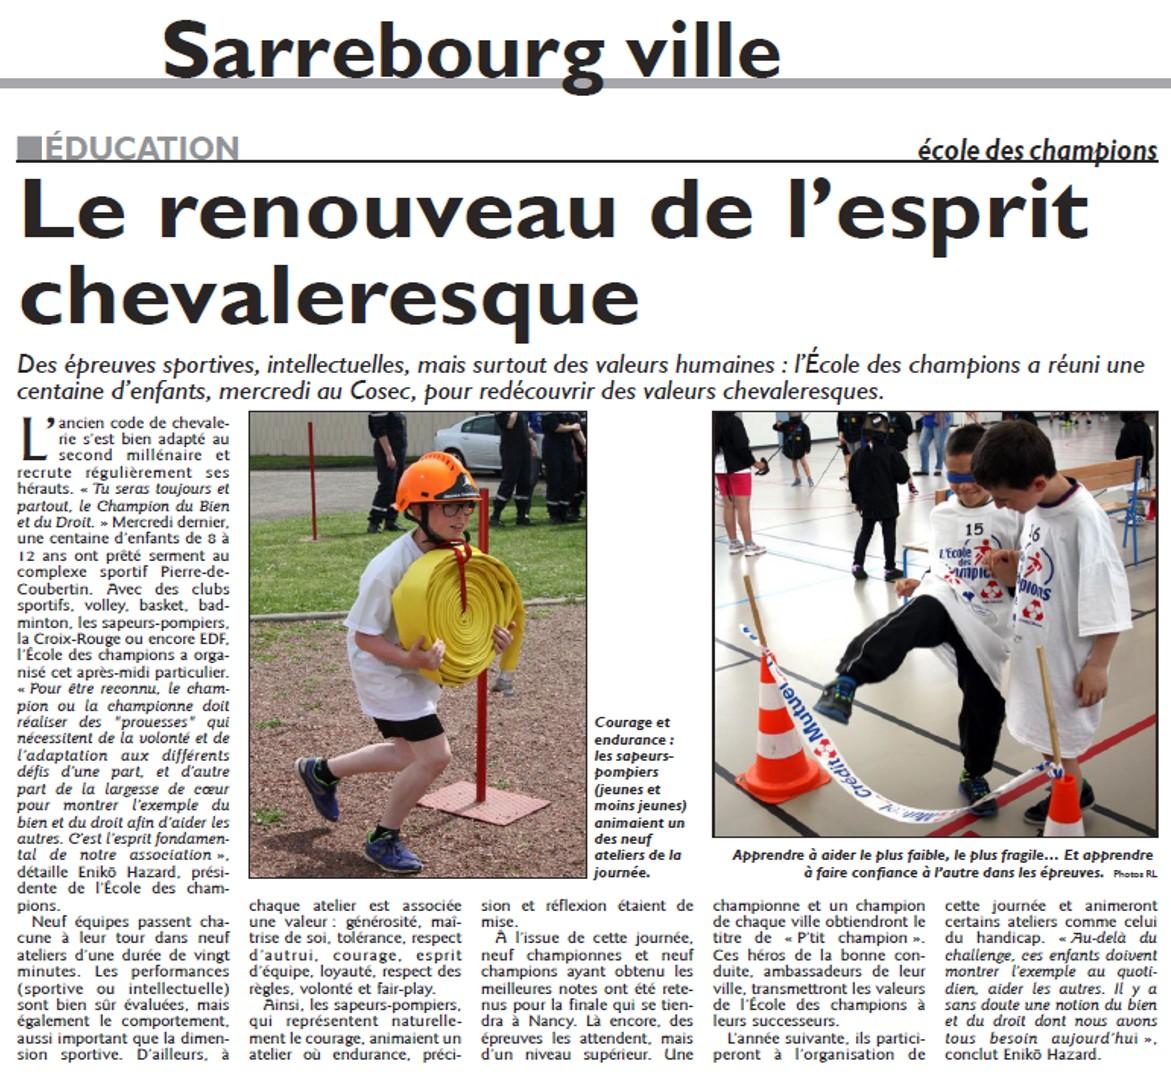 27 avril 2016 - Sarrebourg